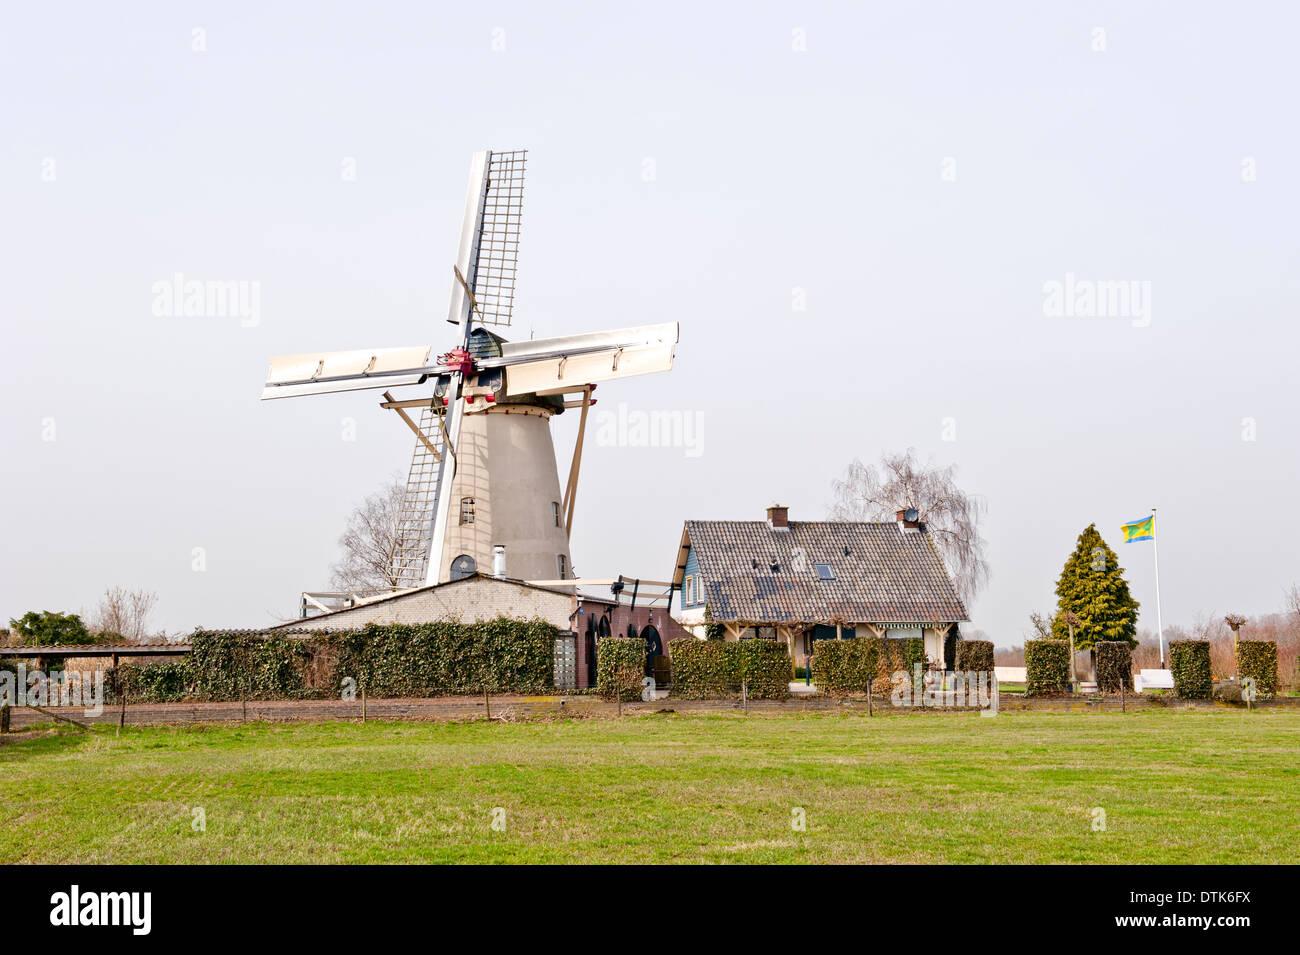 Historic white grain mill in picturesque rural scenery - Stock Image